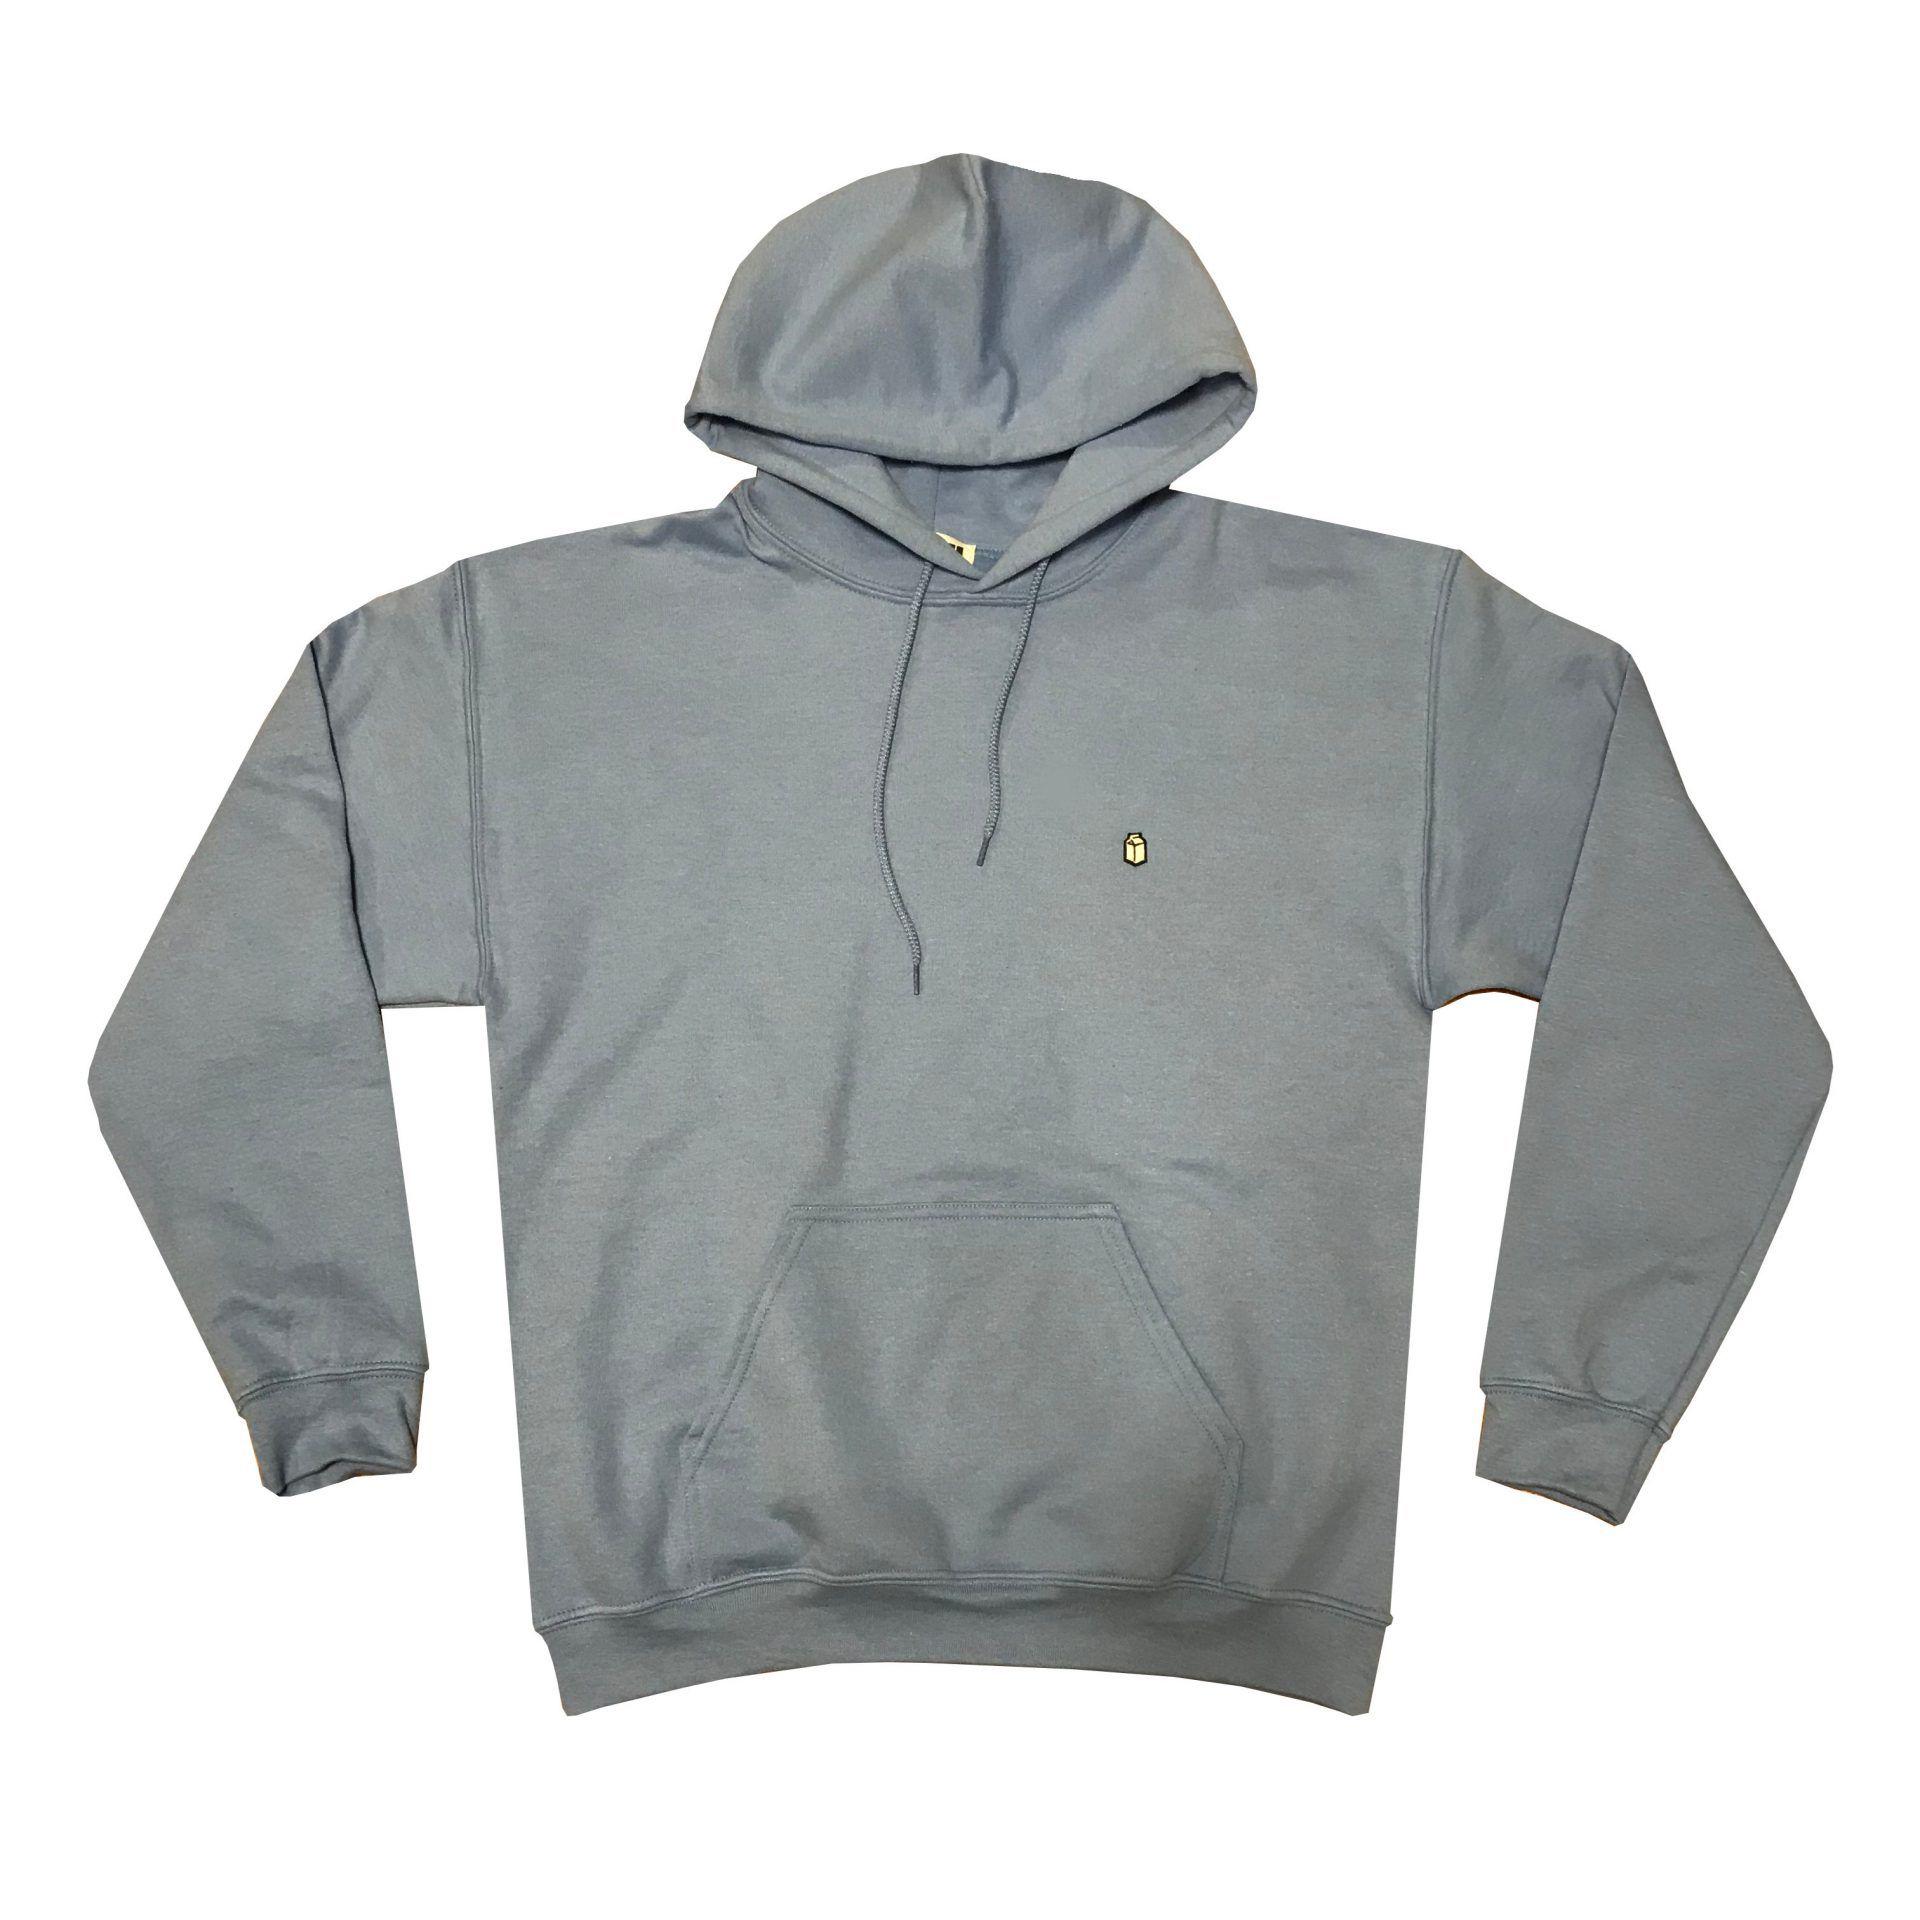 SoYou Clothing Basics Hoodie in Periwinkle